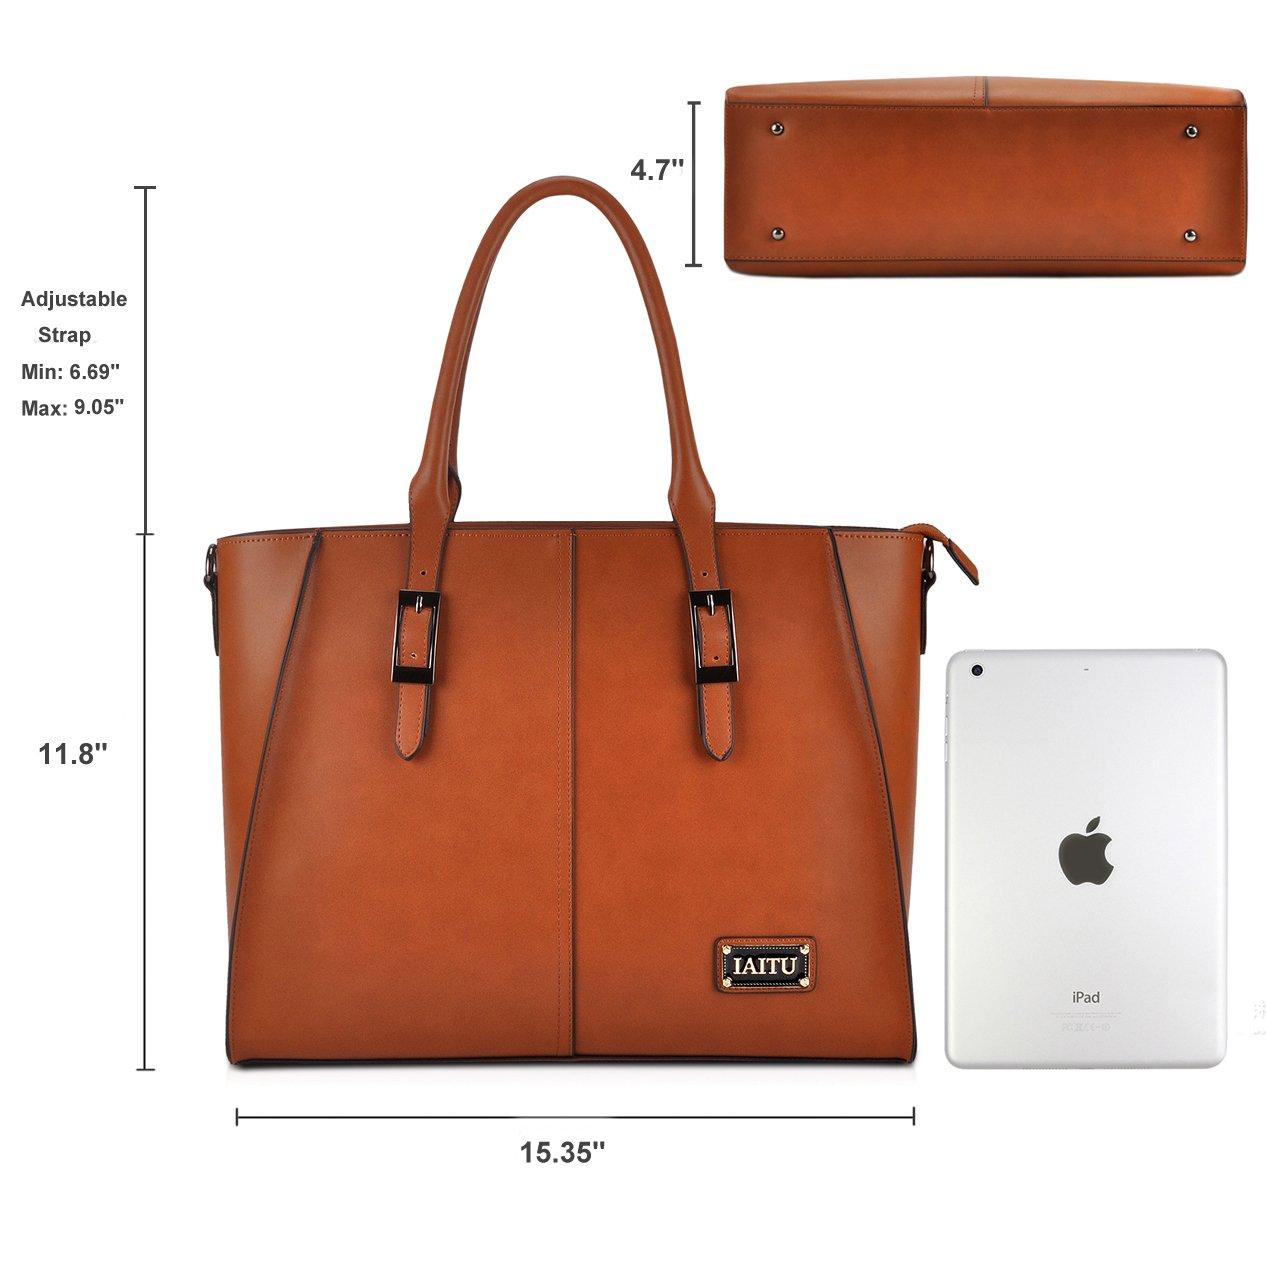 IAITU Laptop Tote Bag,15.6 Inch Crossbody Laptop Bag Casual Work Business Handbag with Smooth Zipper for Women(Brown) by IAITU (Image #4)